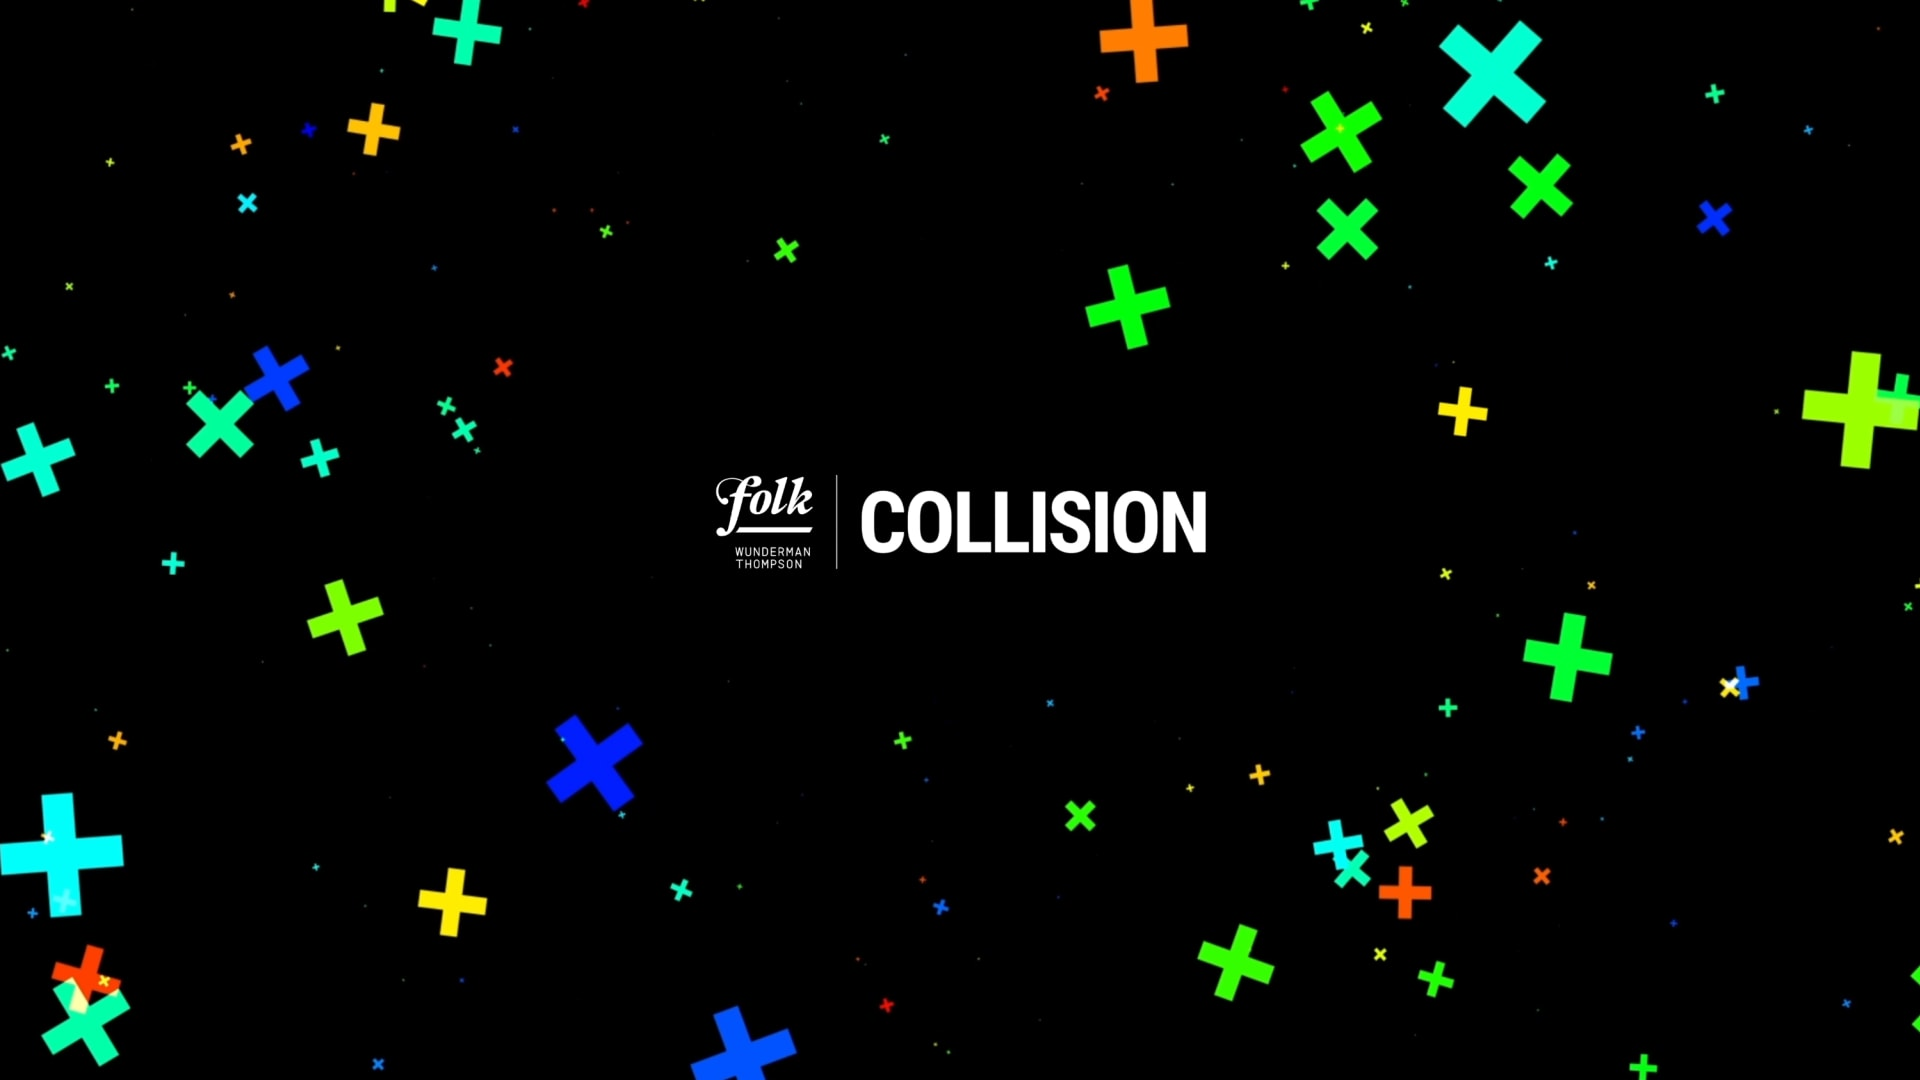 Collision insight folk3